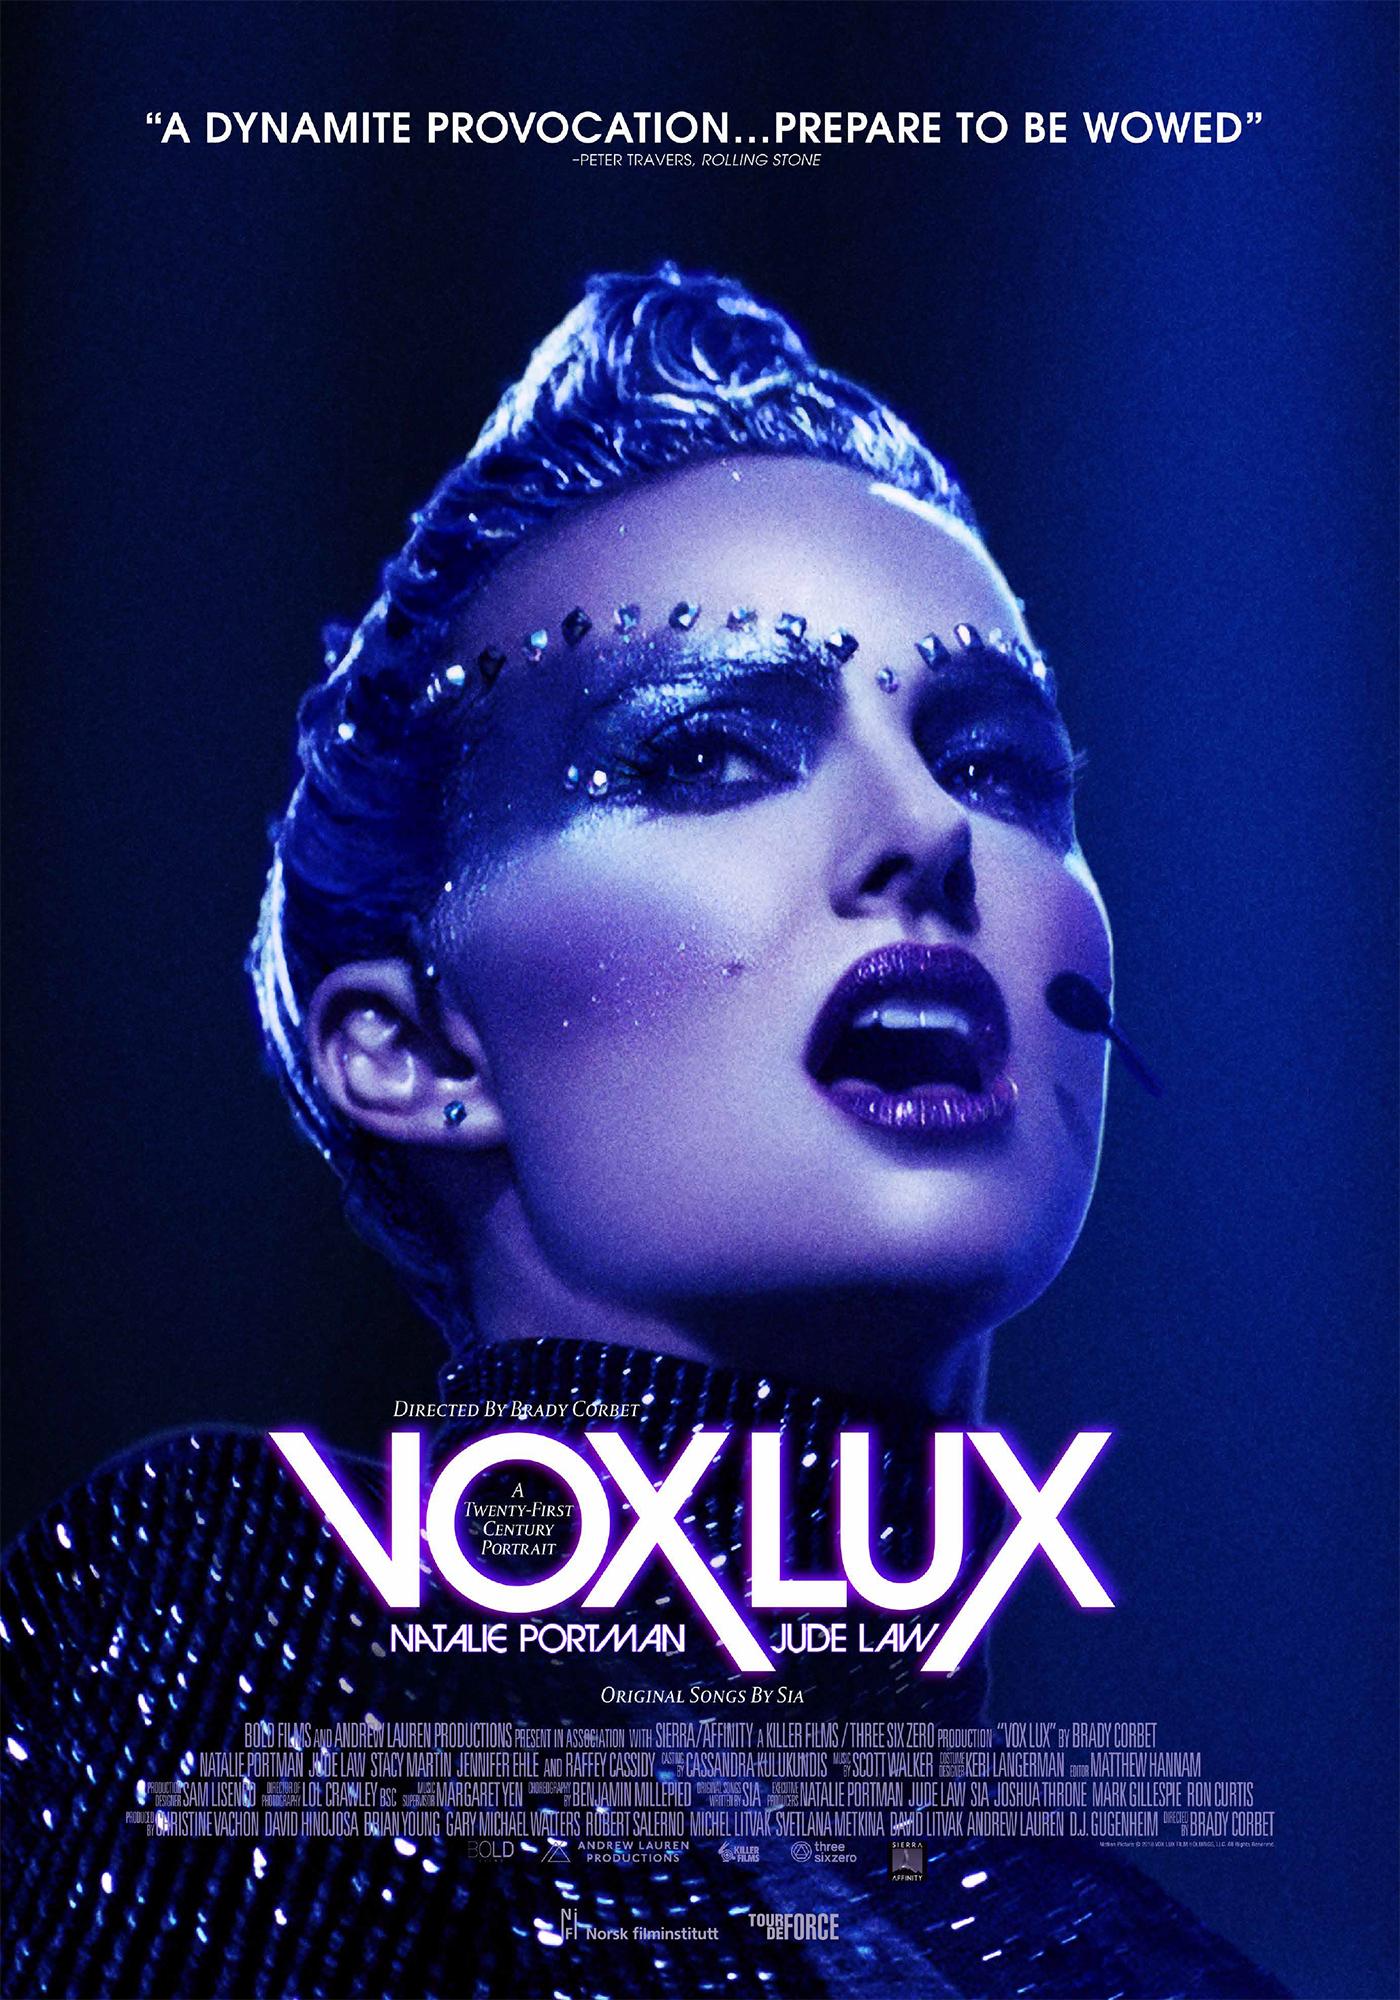 Vox Lux 70x100cm_1400x2000.jpg